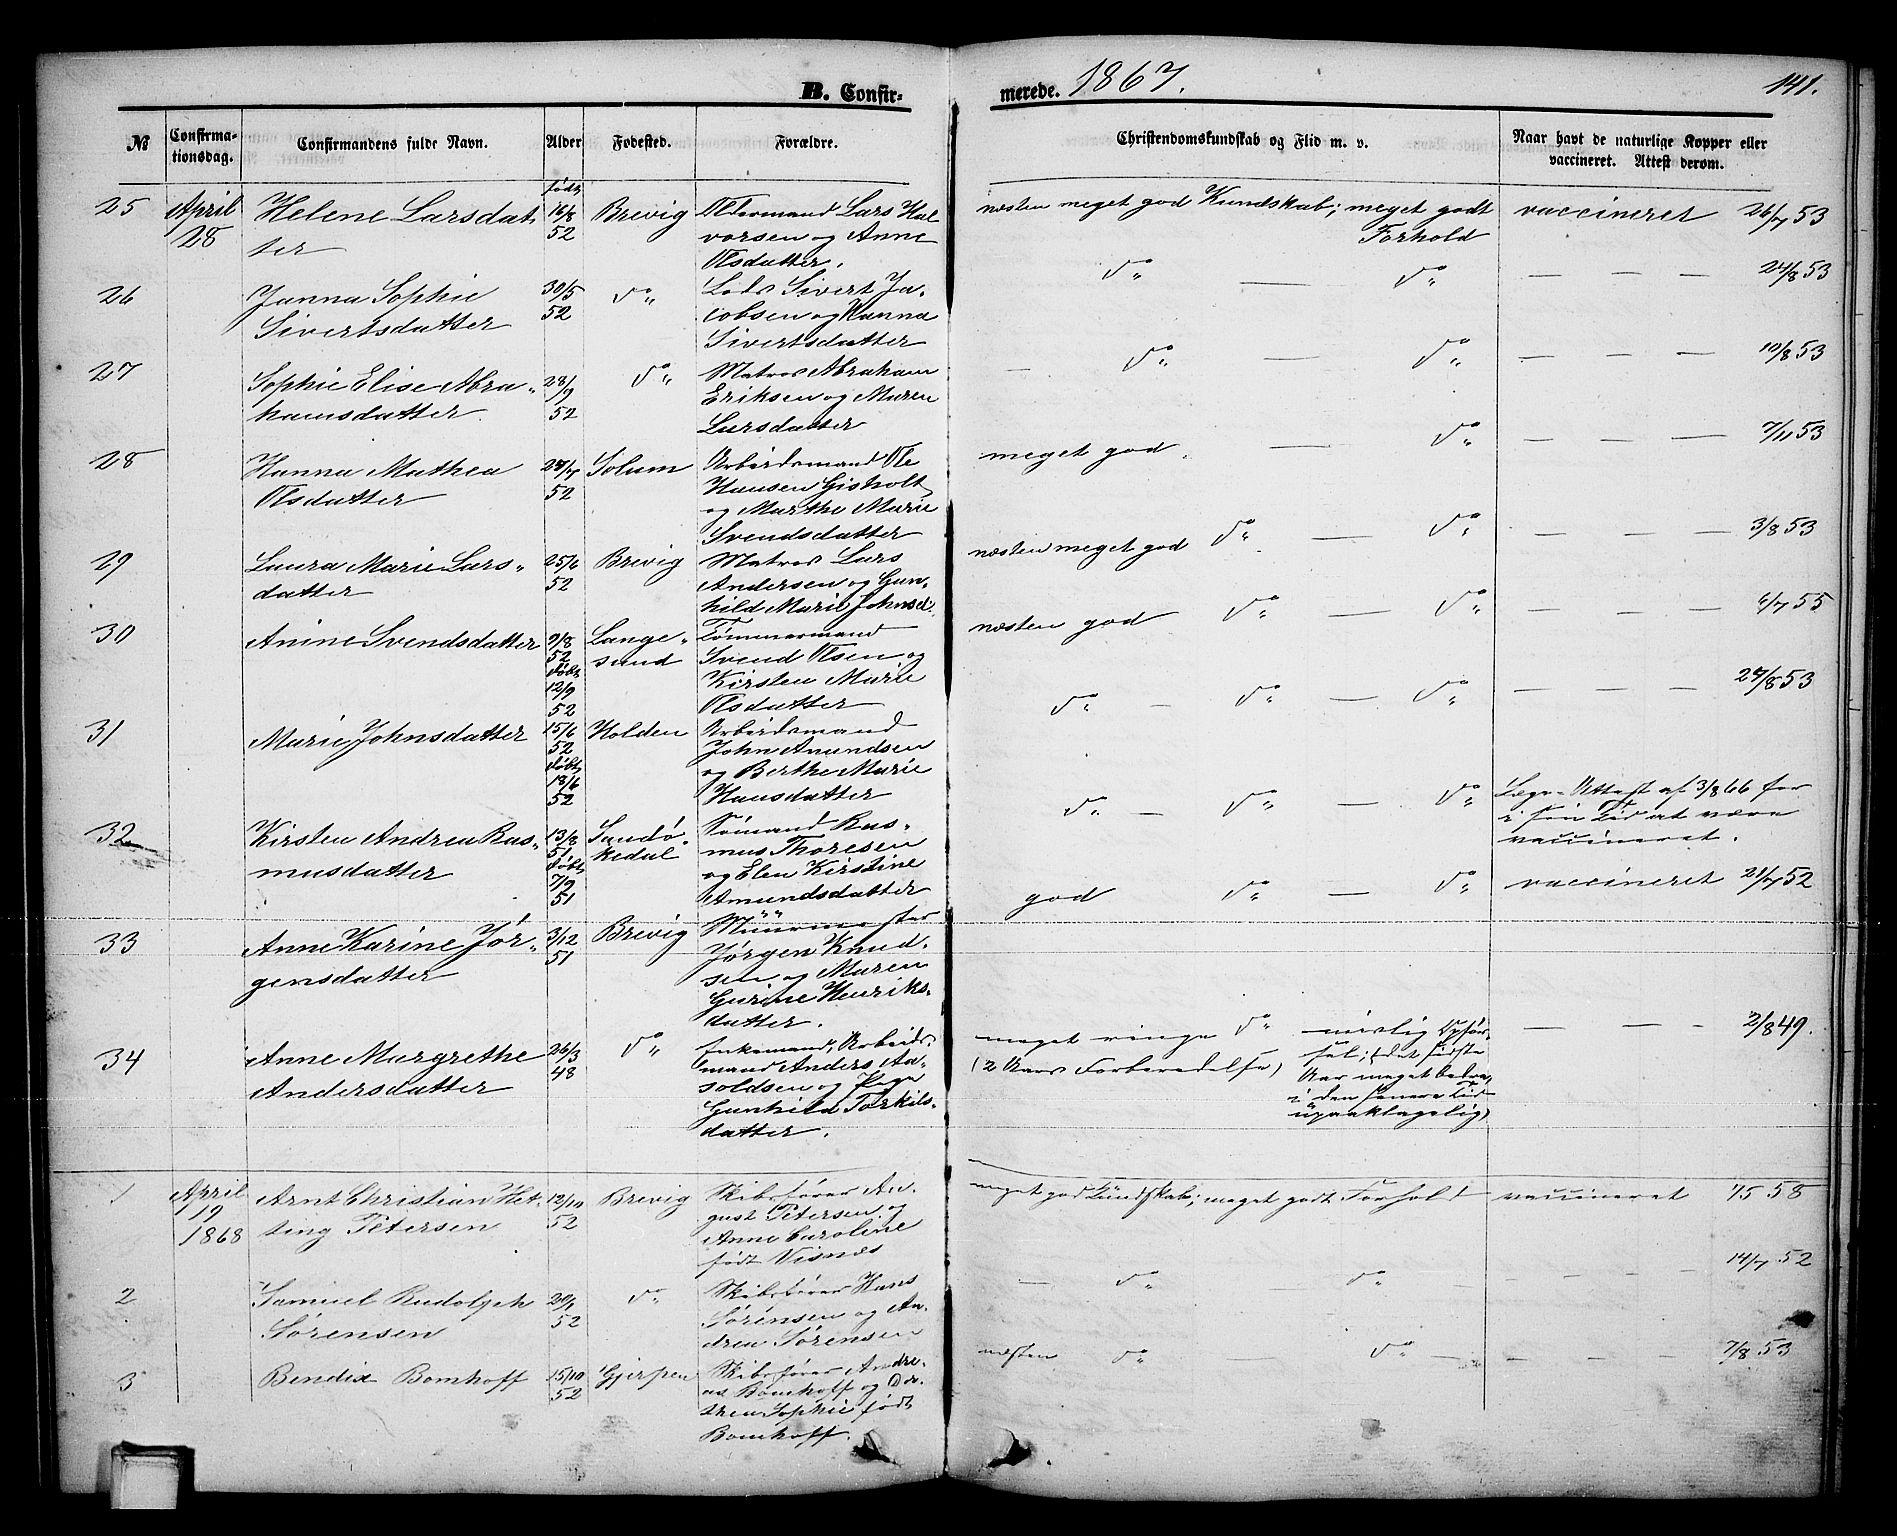 SAKO, Brevik kirkebøker, G/Ga/L0003: Klokkerbok nr. 3, 1866-1881, s. 141